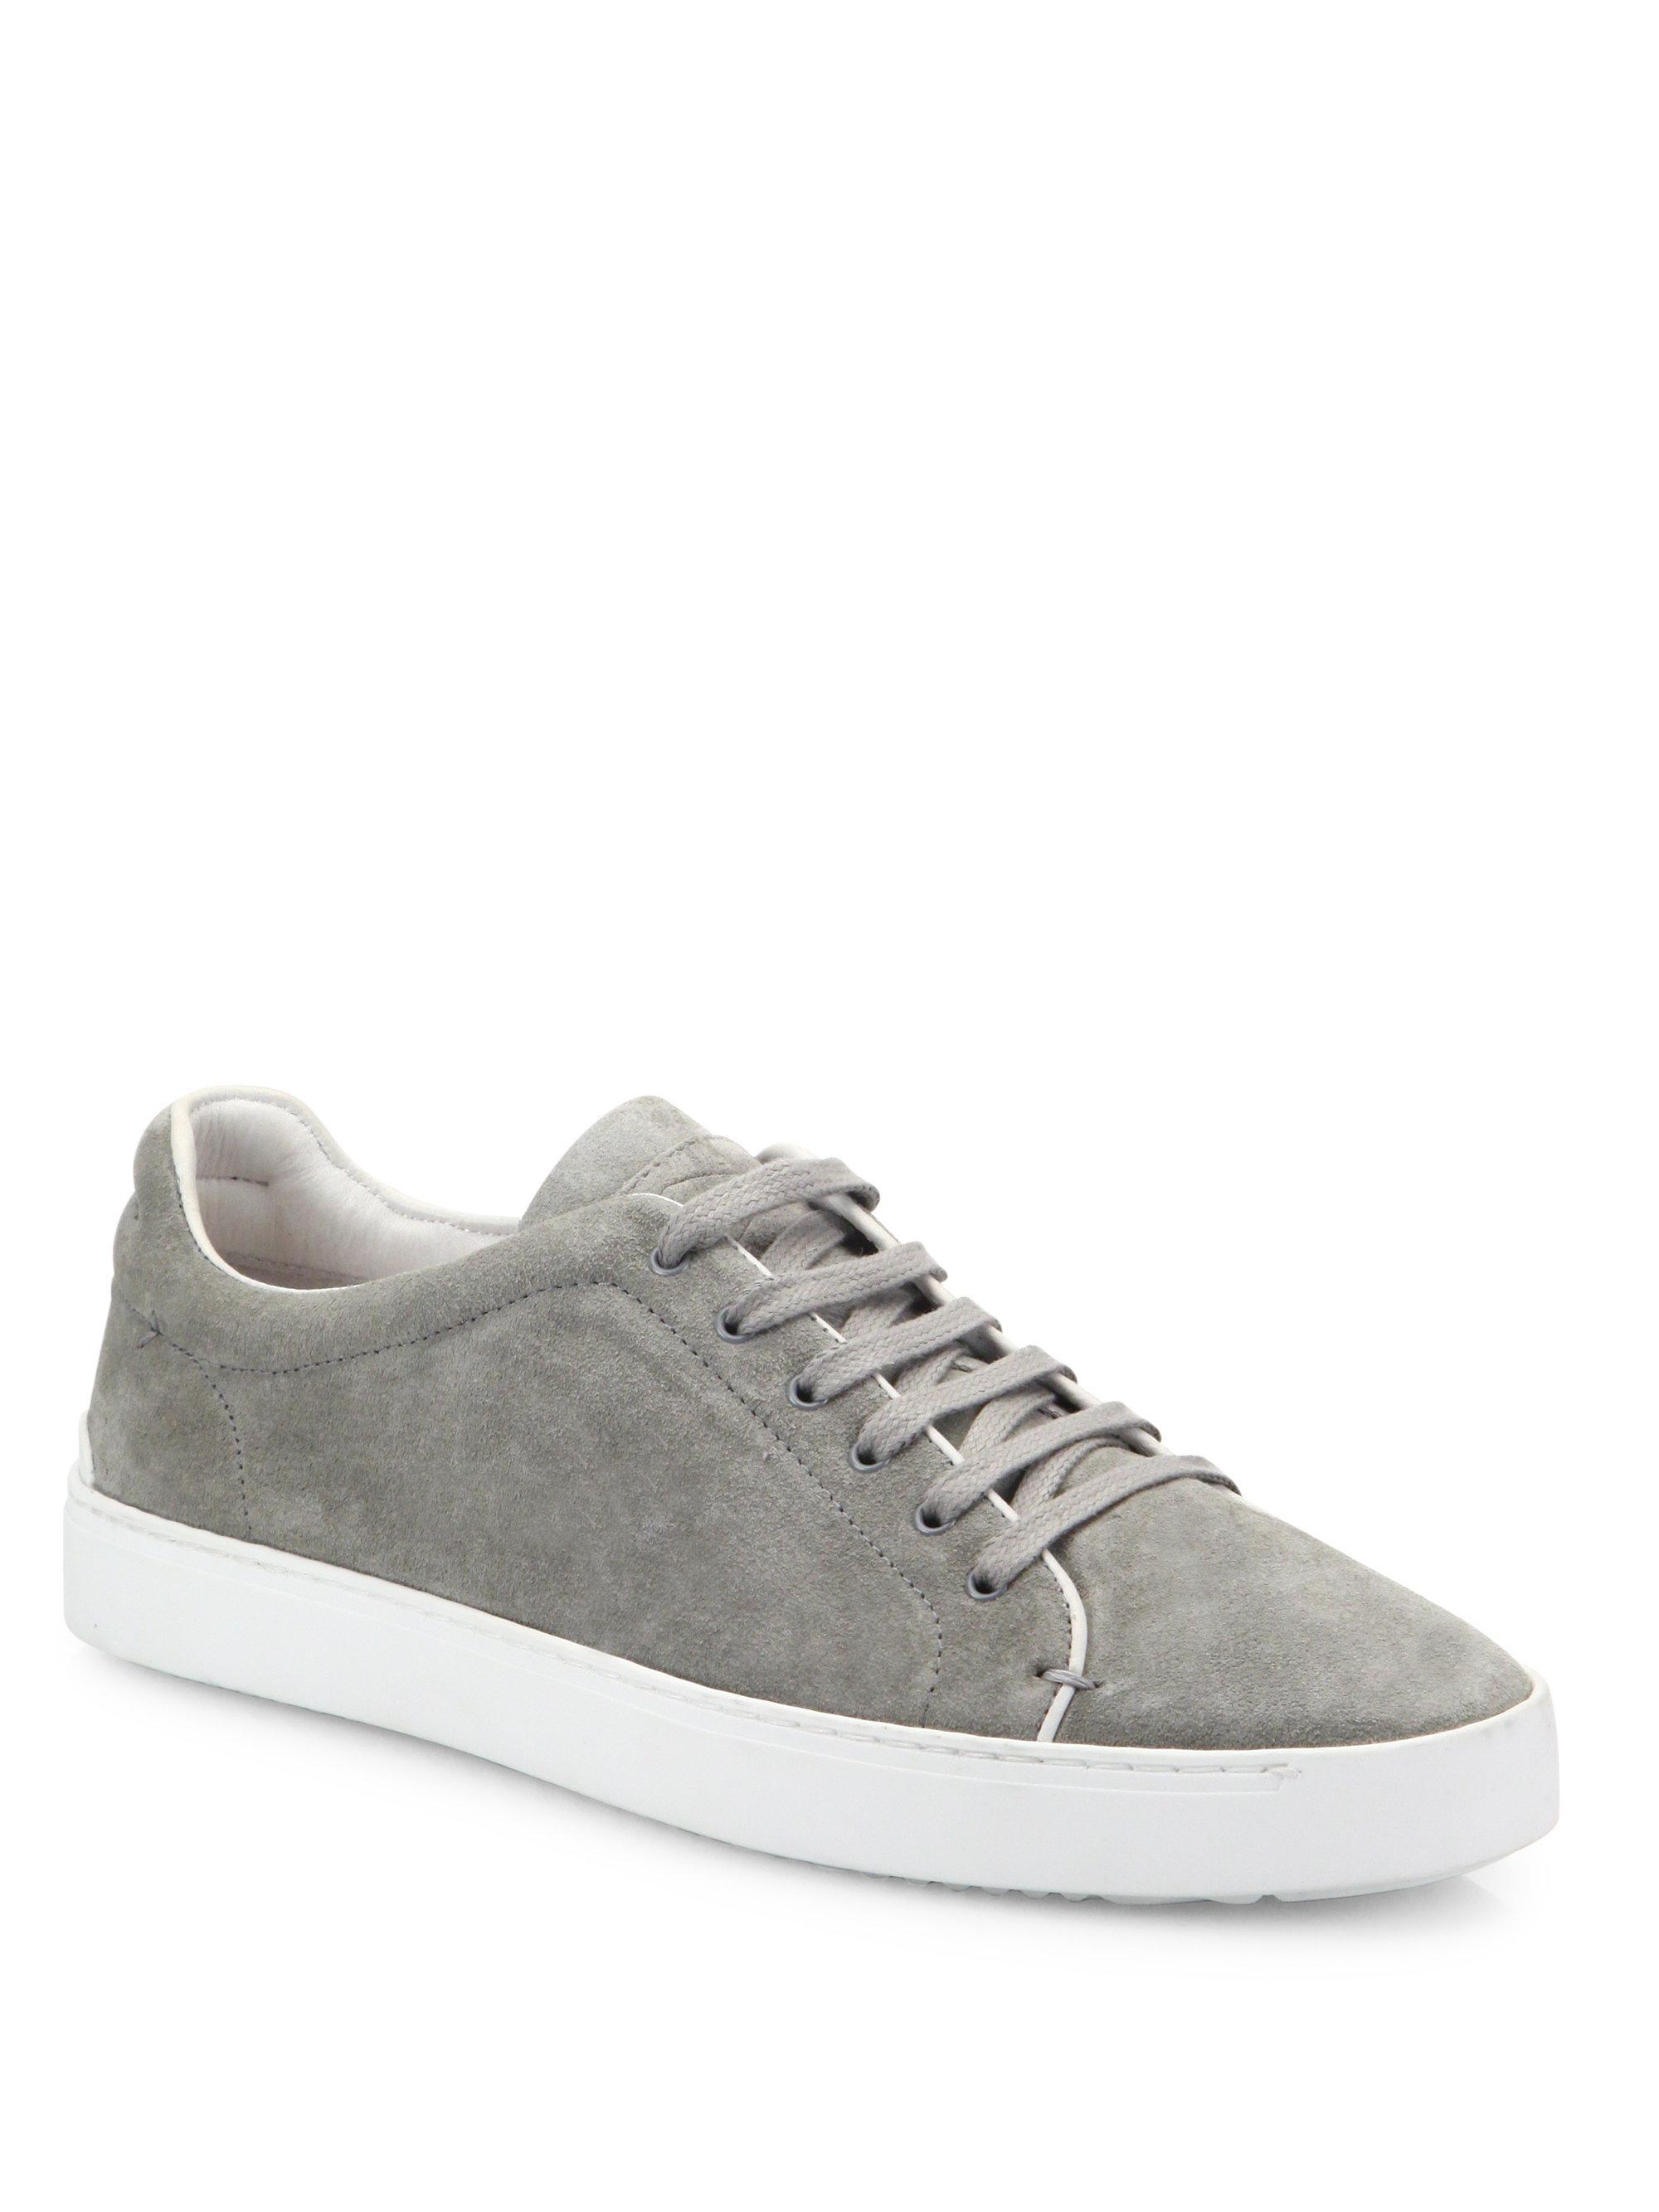 RAG&BONE Nefer Cemento Suede Sneakers QJxbNM4Qh